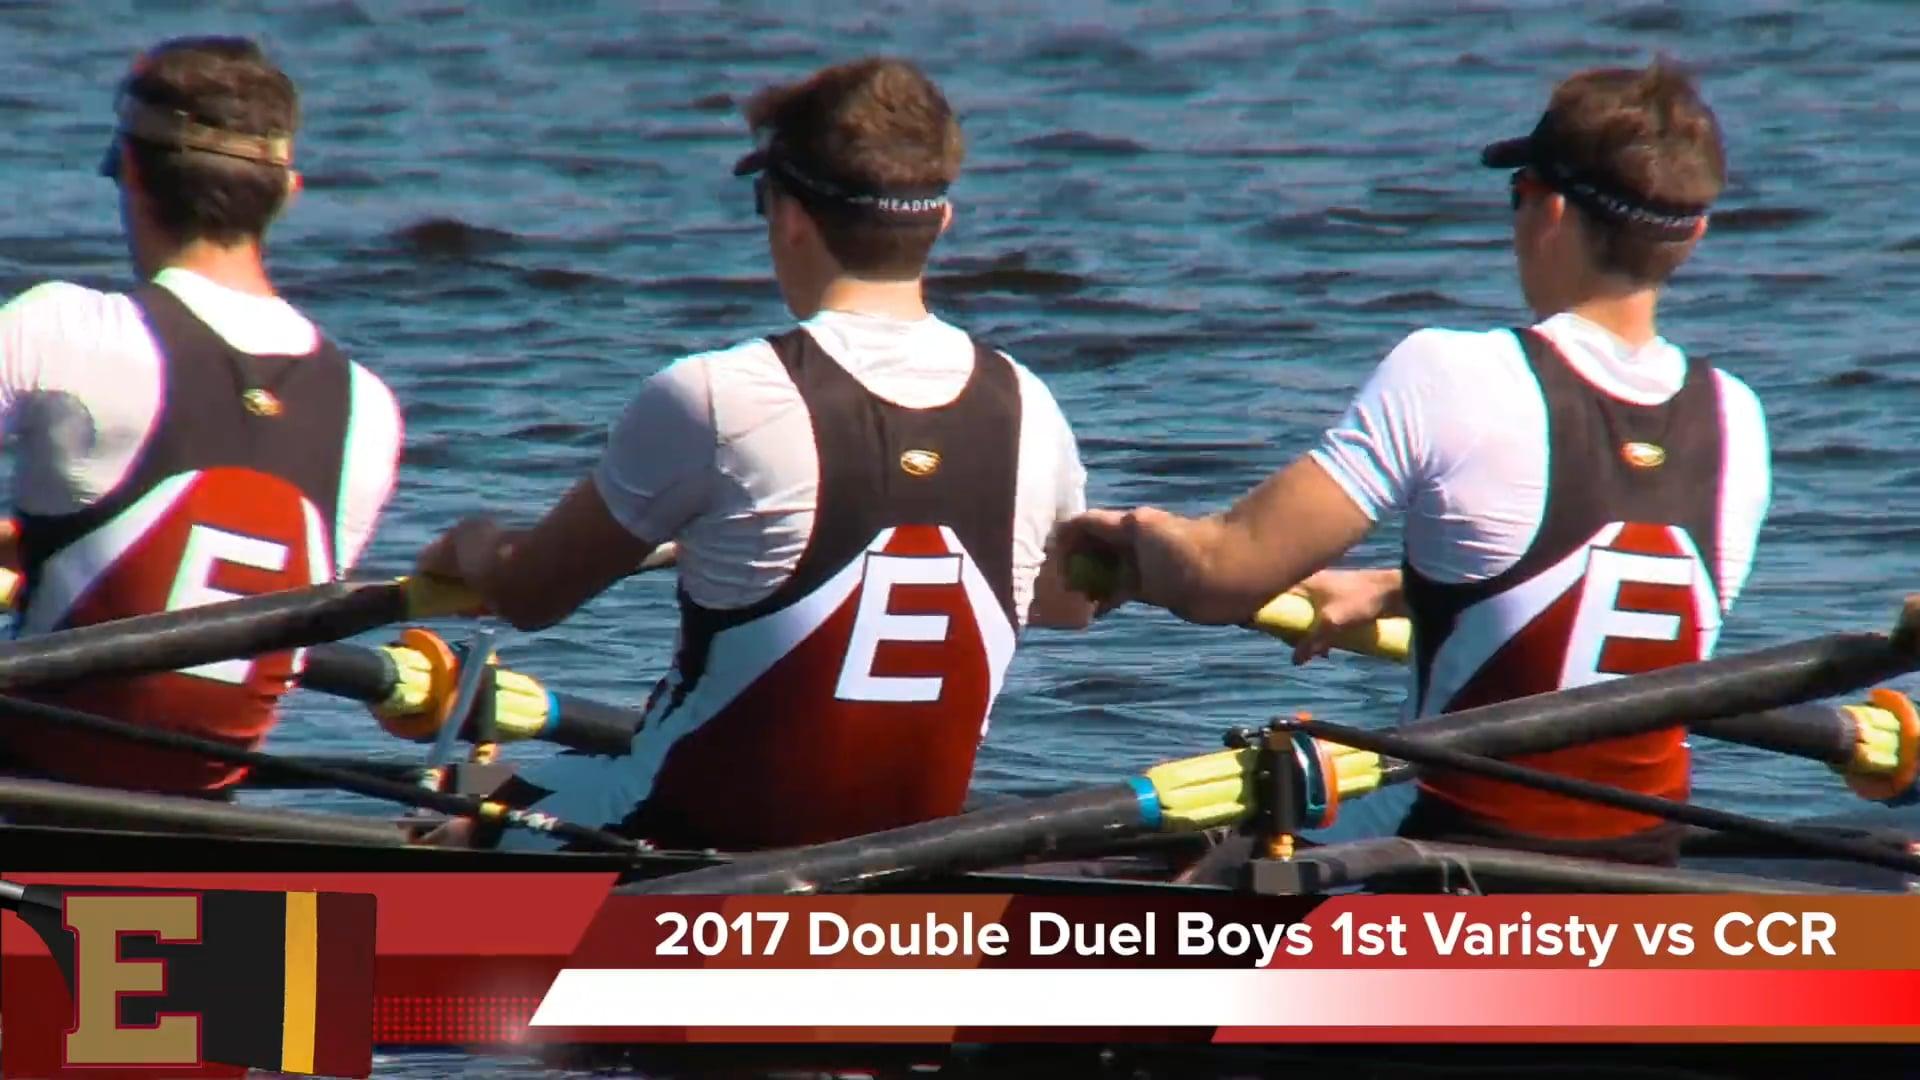 Boys 1st Varsity 2017 Double Duel Jacksonville Episcopal vs Capital City Rowing